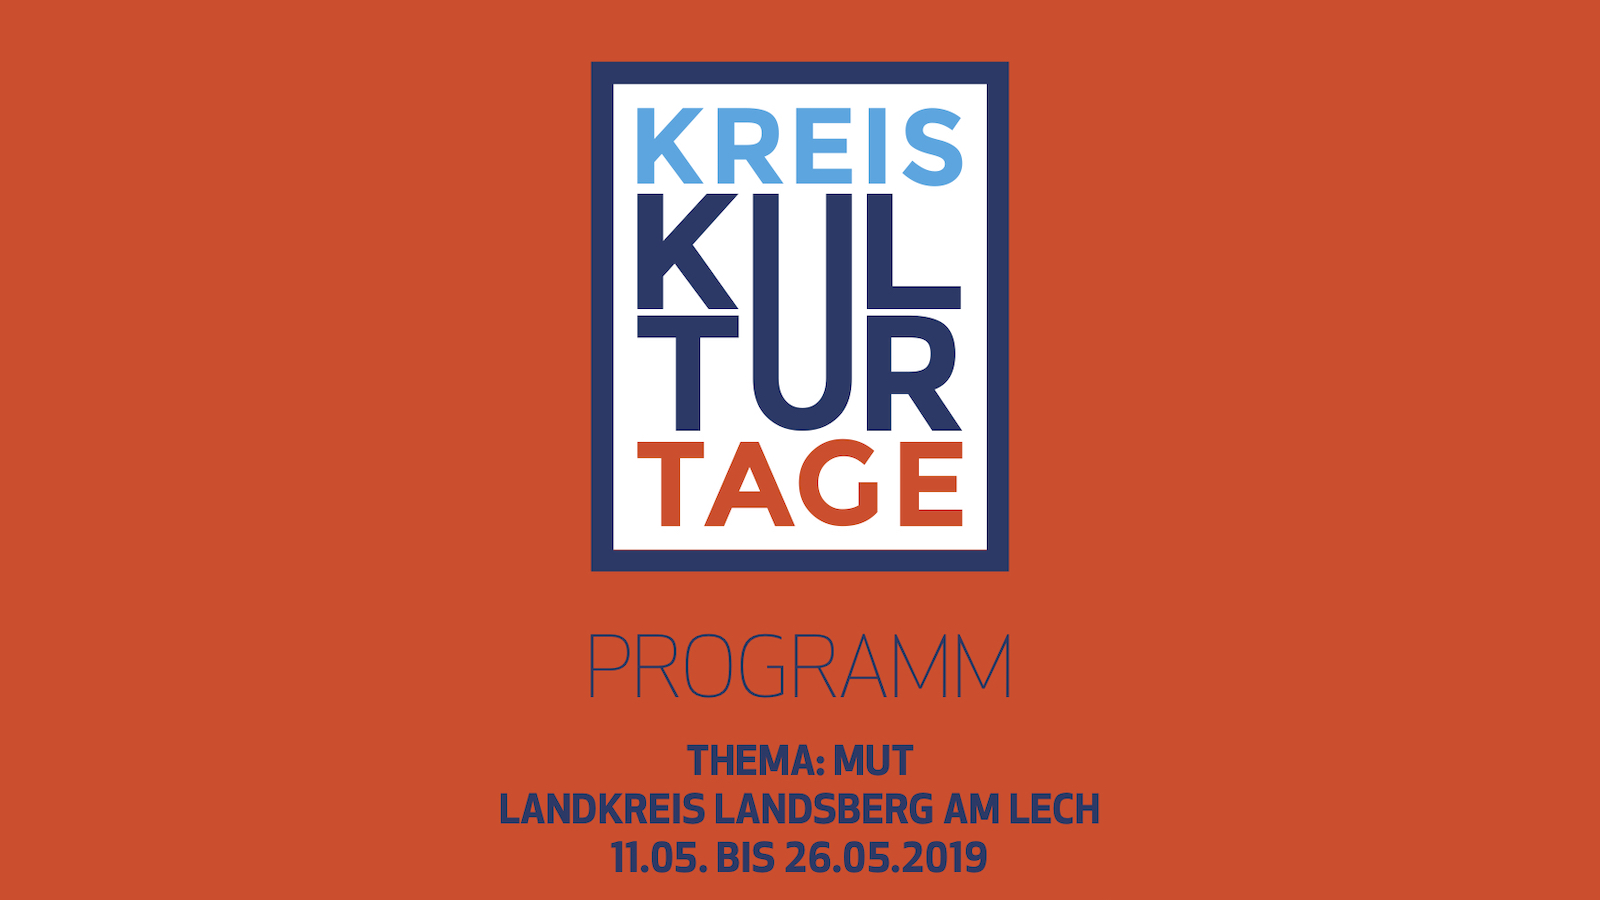 Kreiskulturtage 2019 Landsberg am Lech